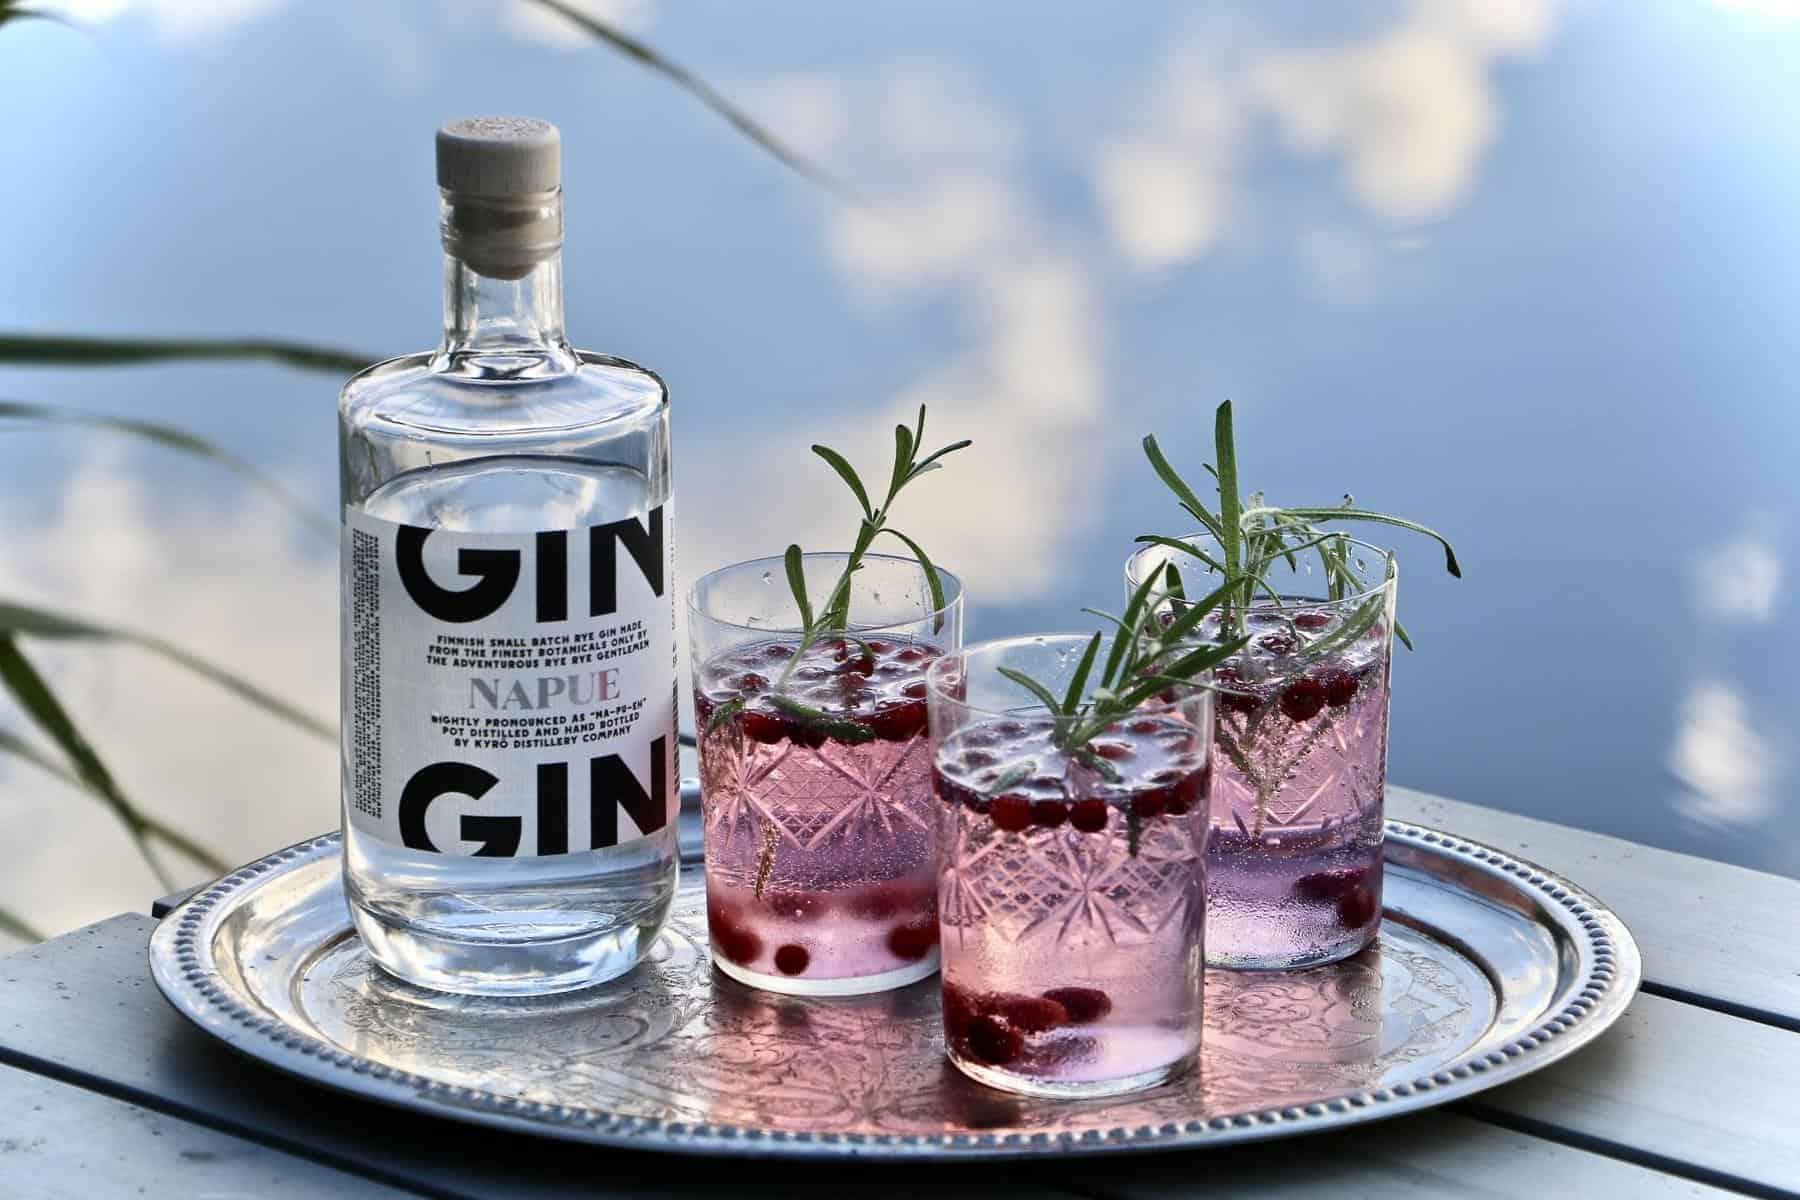 Napue gin finland